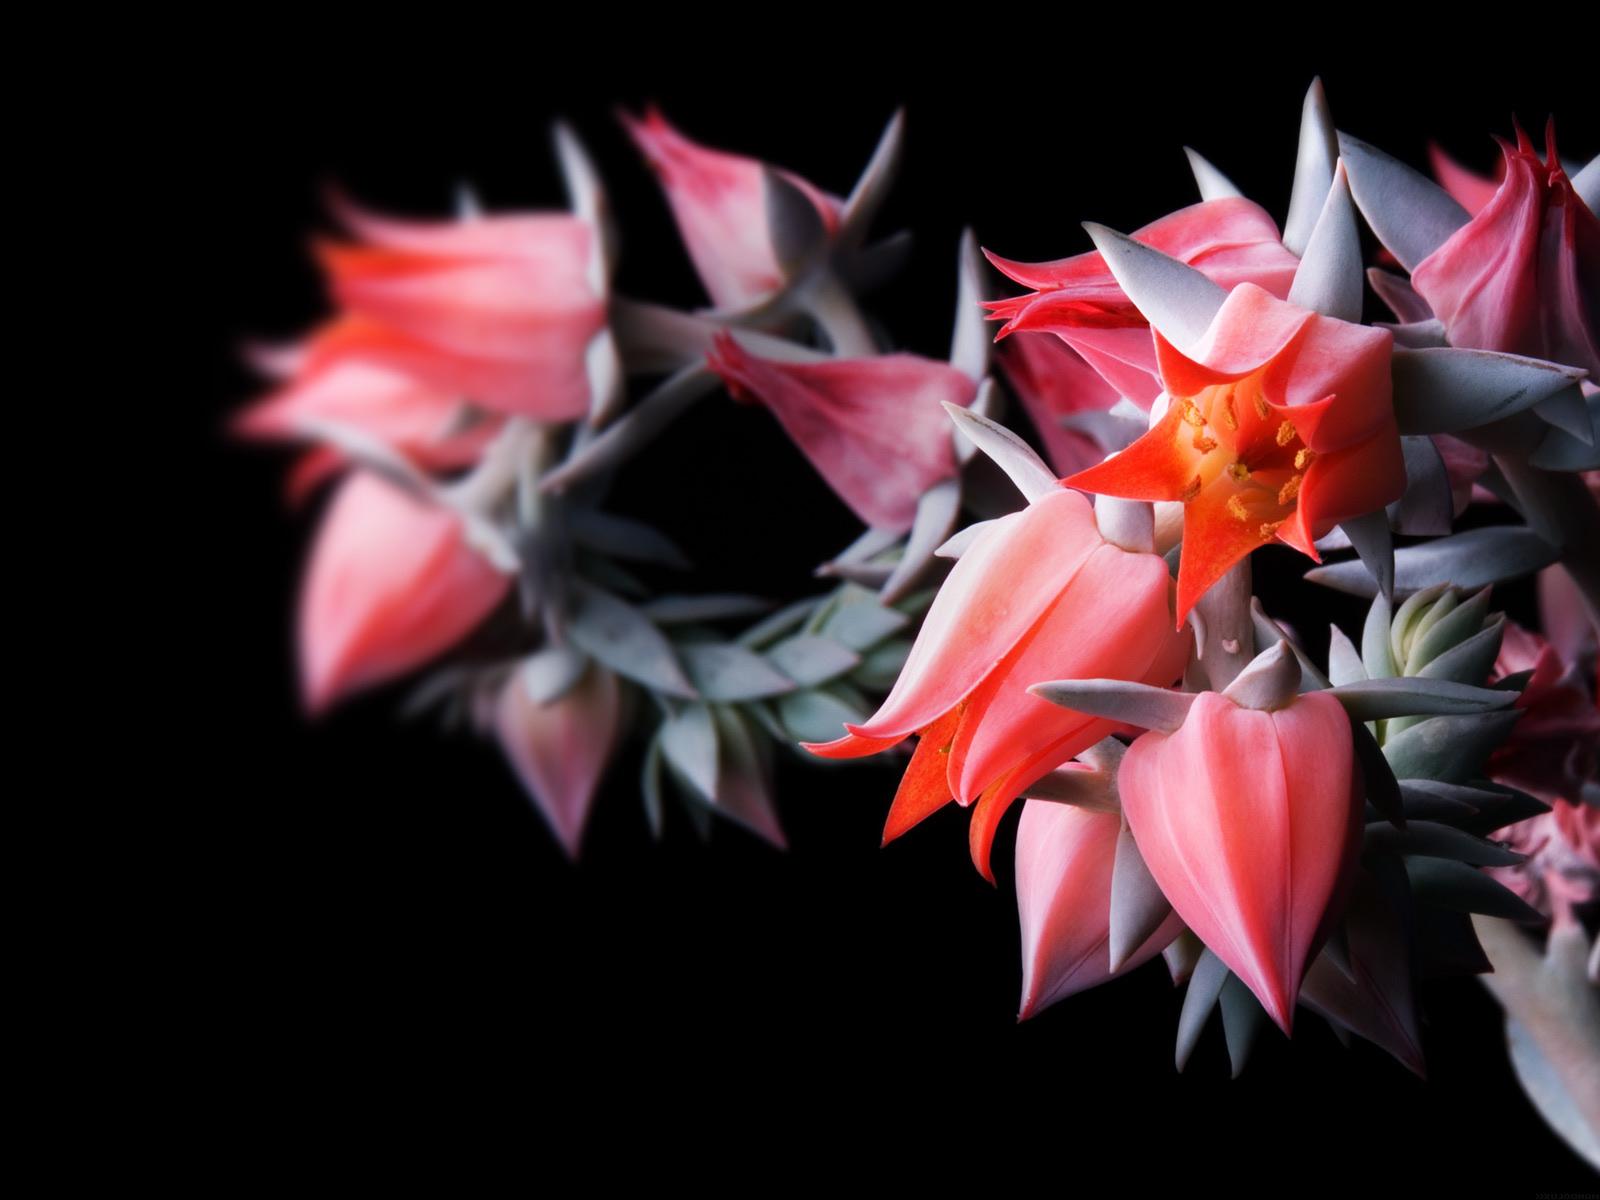 Flowers in Black Wallpapers   HD Wallpapers